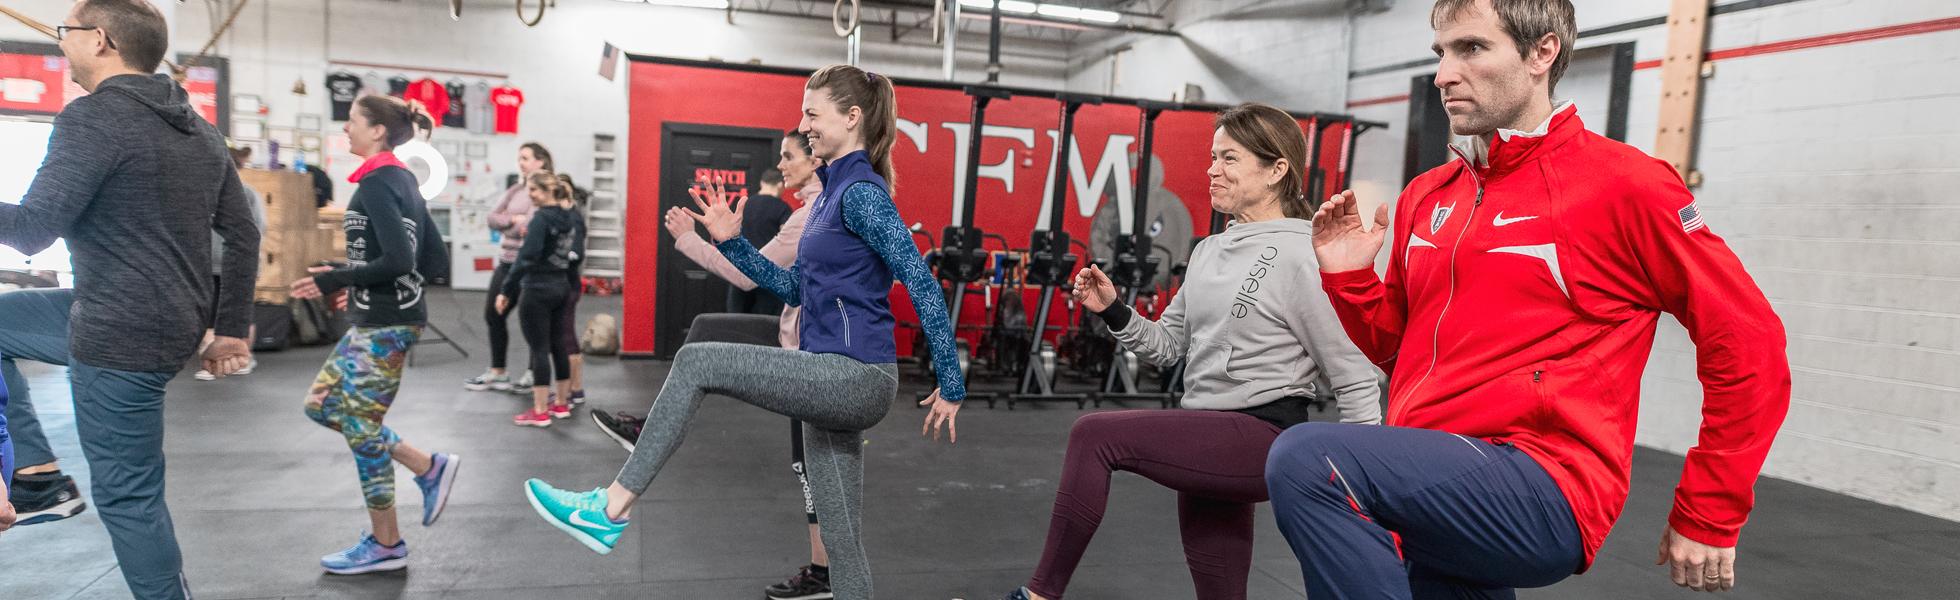 running specific strength training